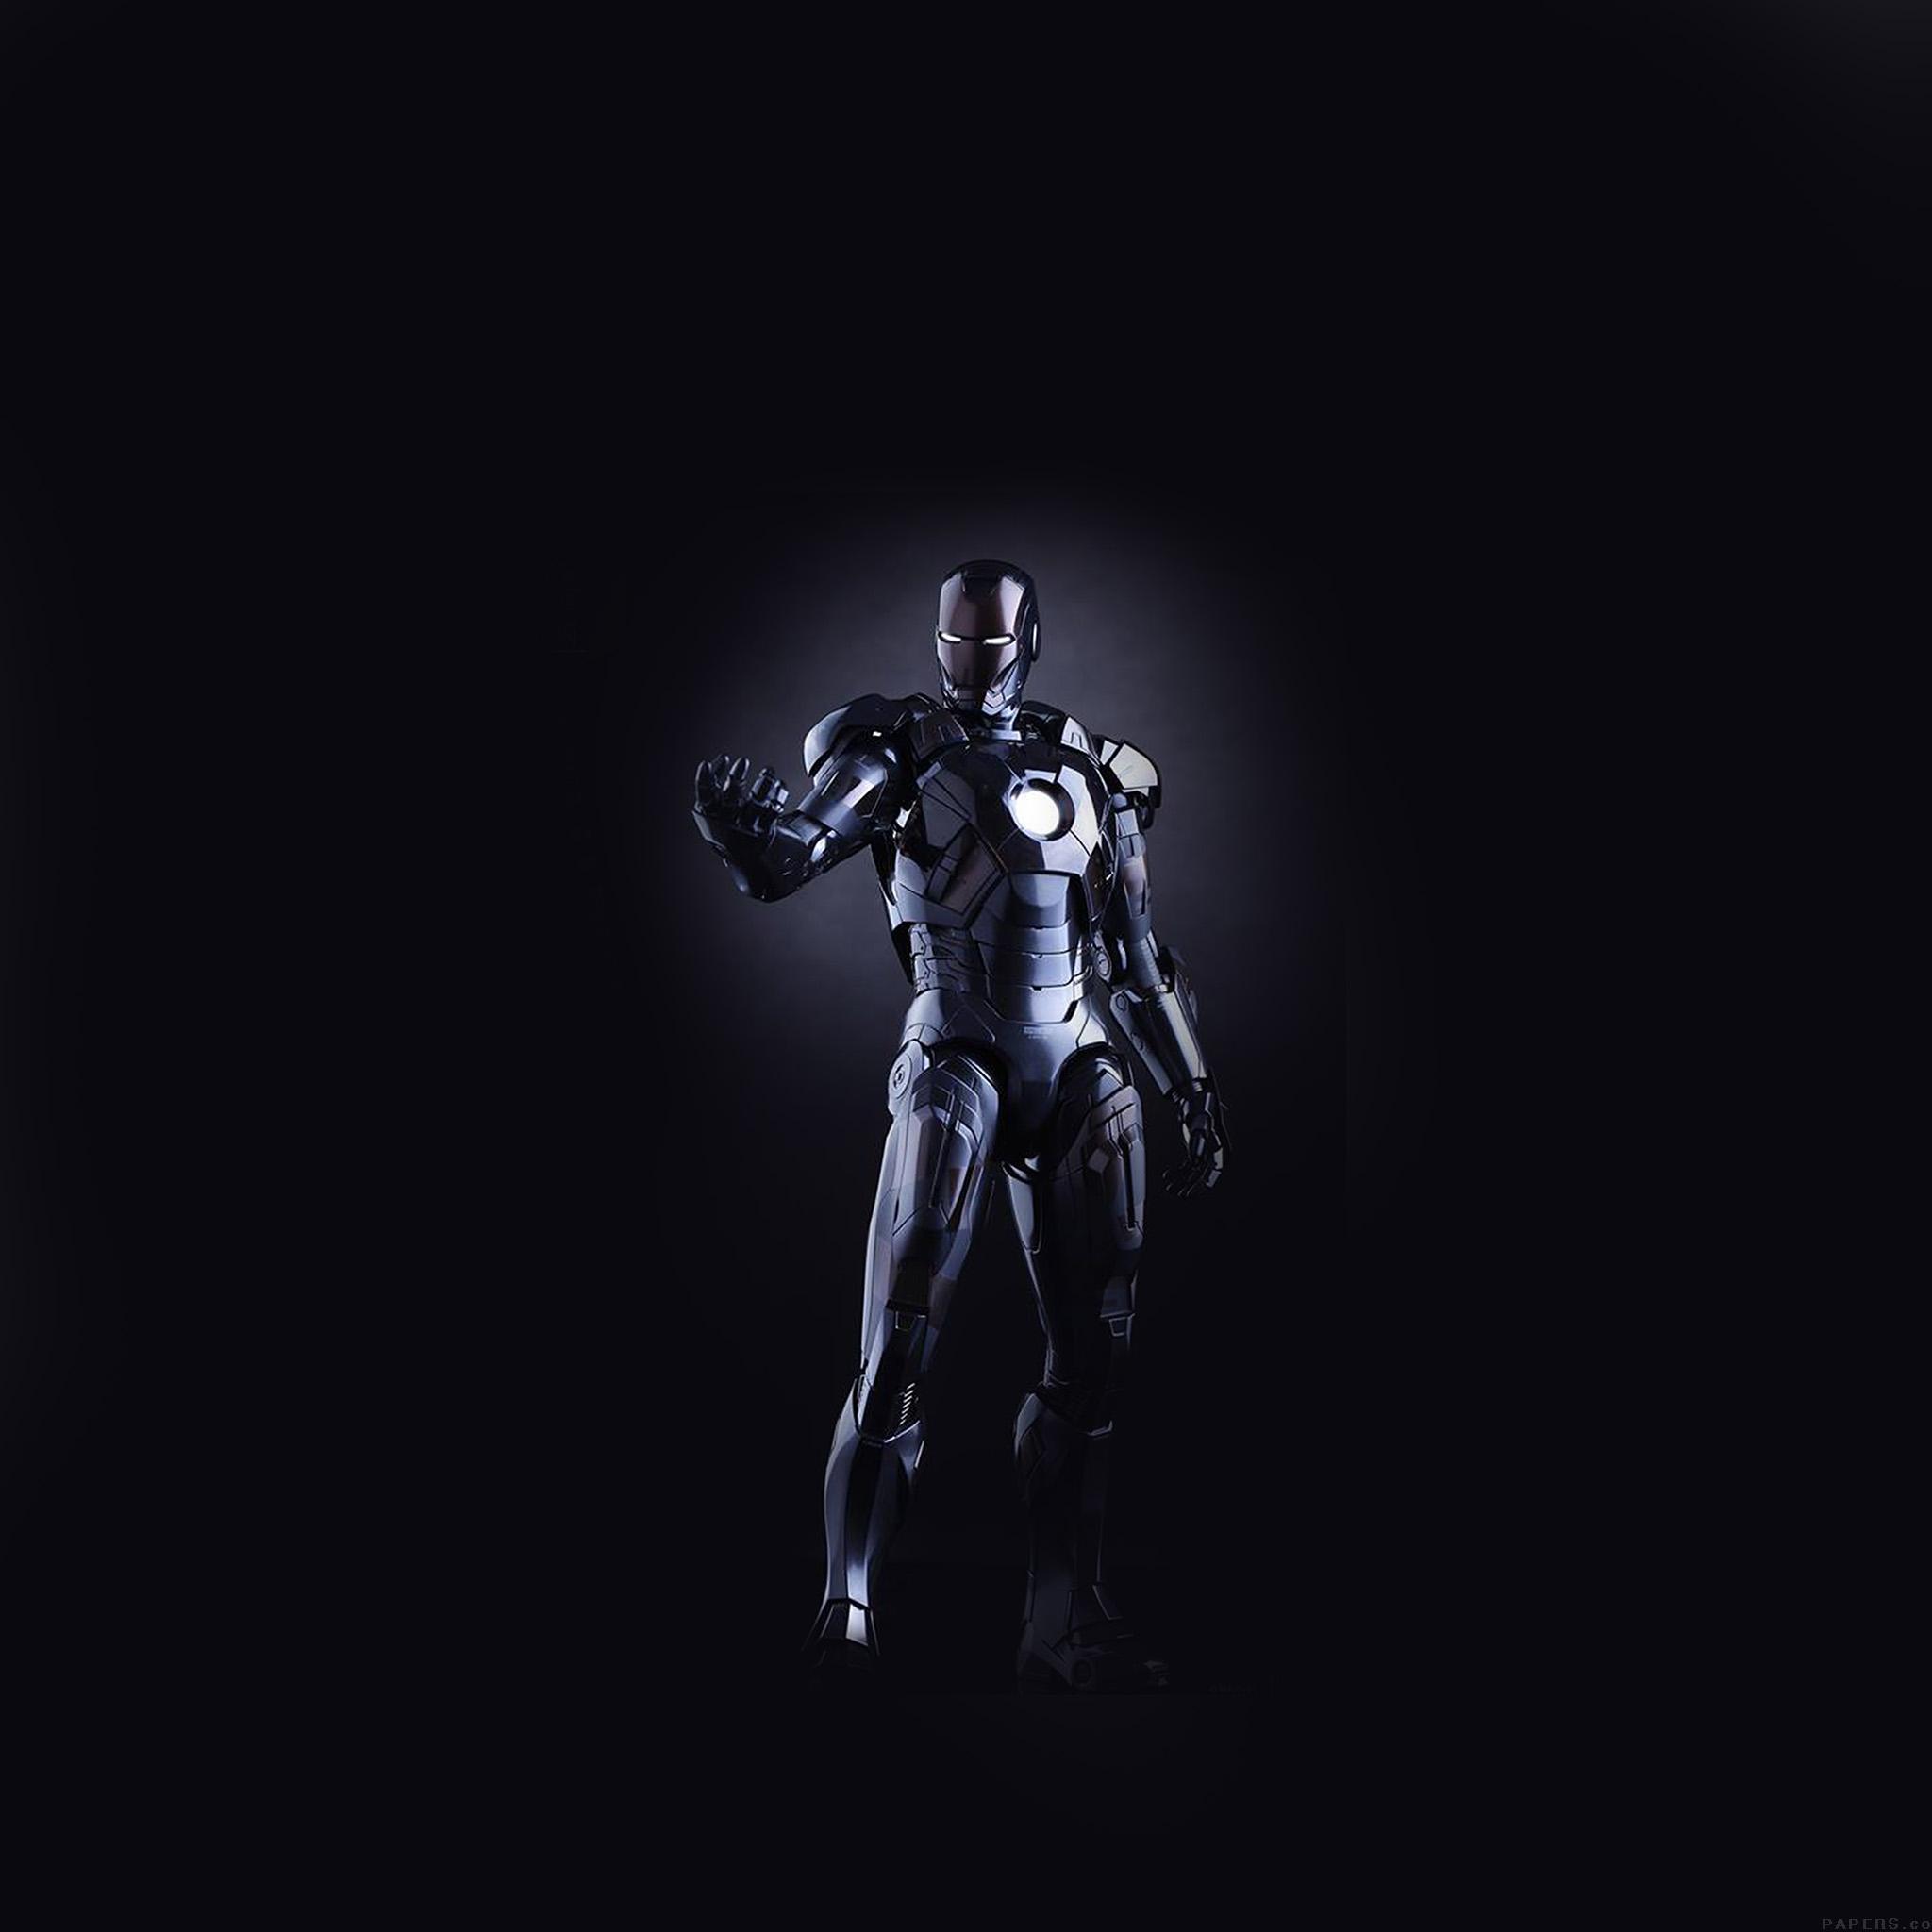 Wallpaper Iphone Superhero: Al99-ironman-dark-figure-hero-art-avengers